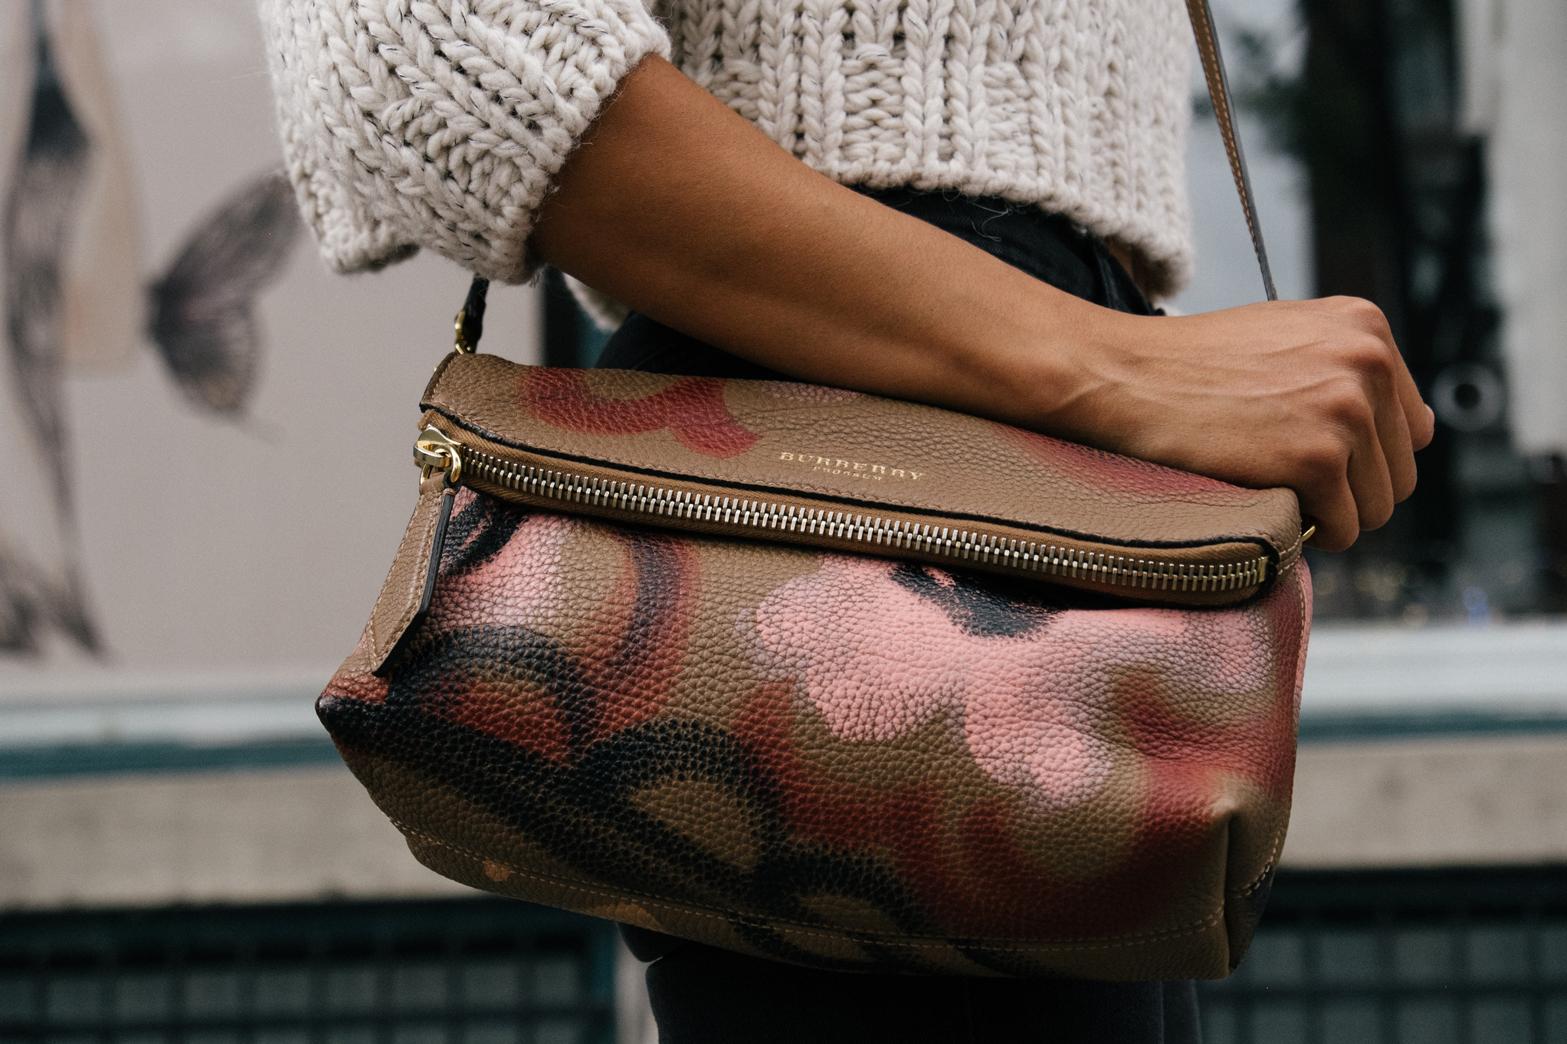 ensaio feminino moda fashion go go bolsa roupa mulher